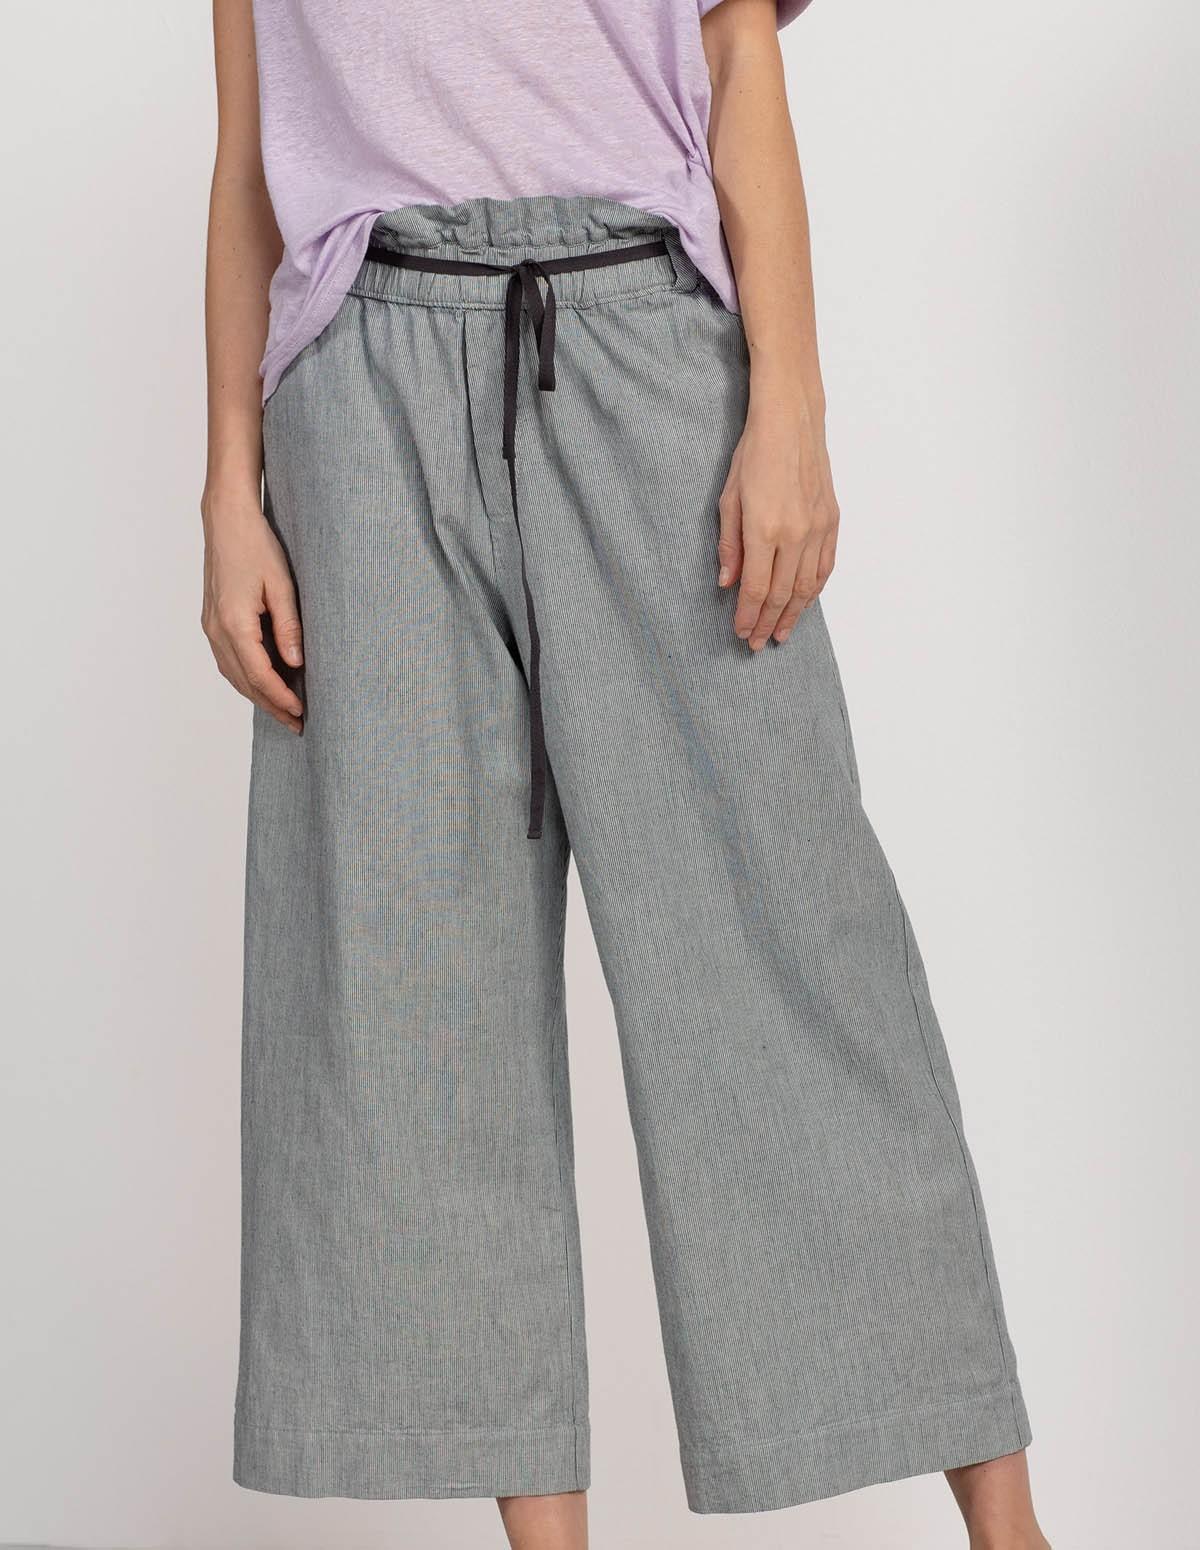 Huma Thime Pants - SHADOW